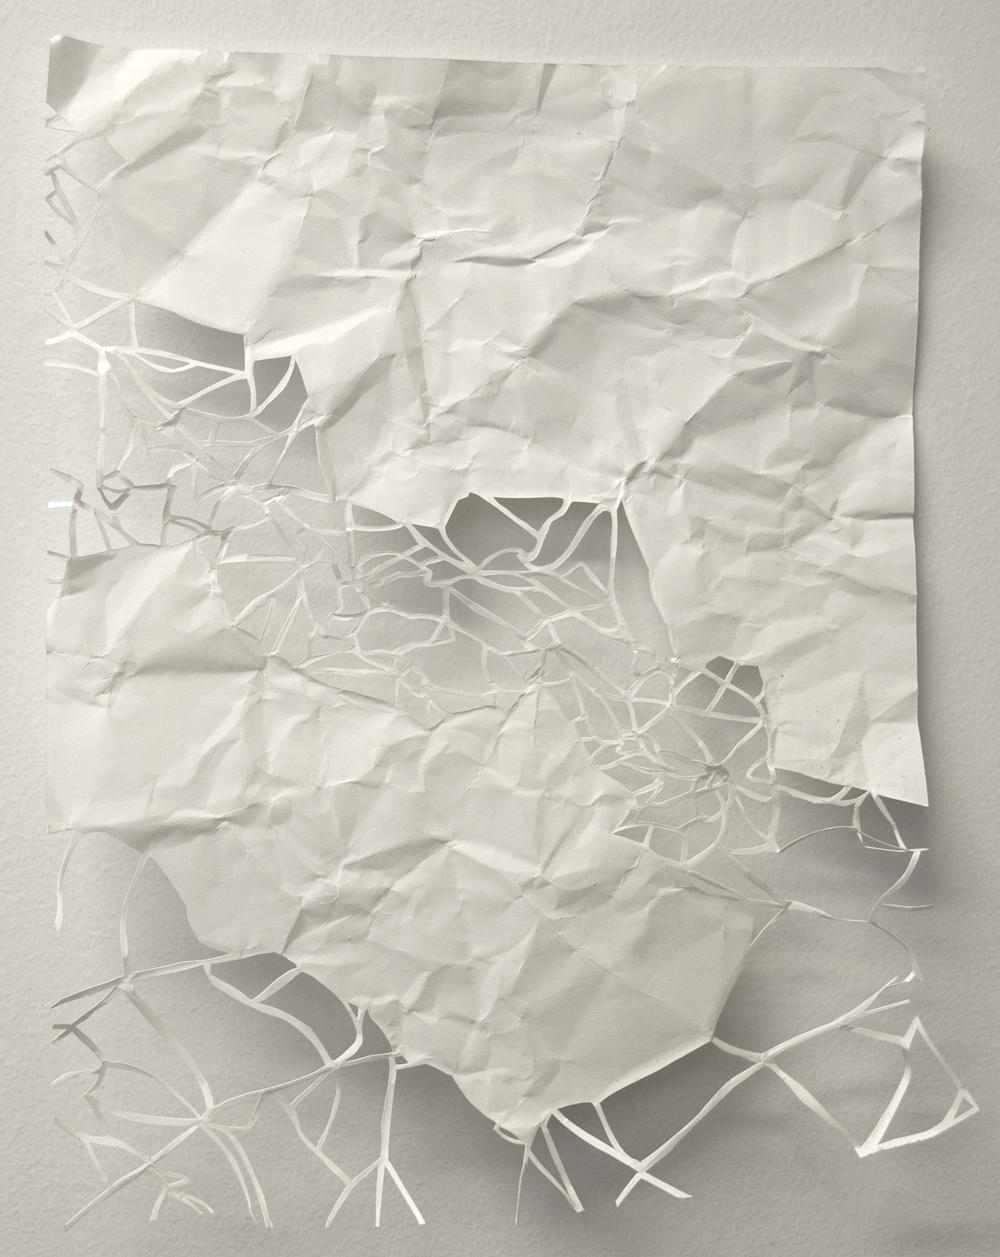 Paper Ball 64